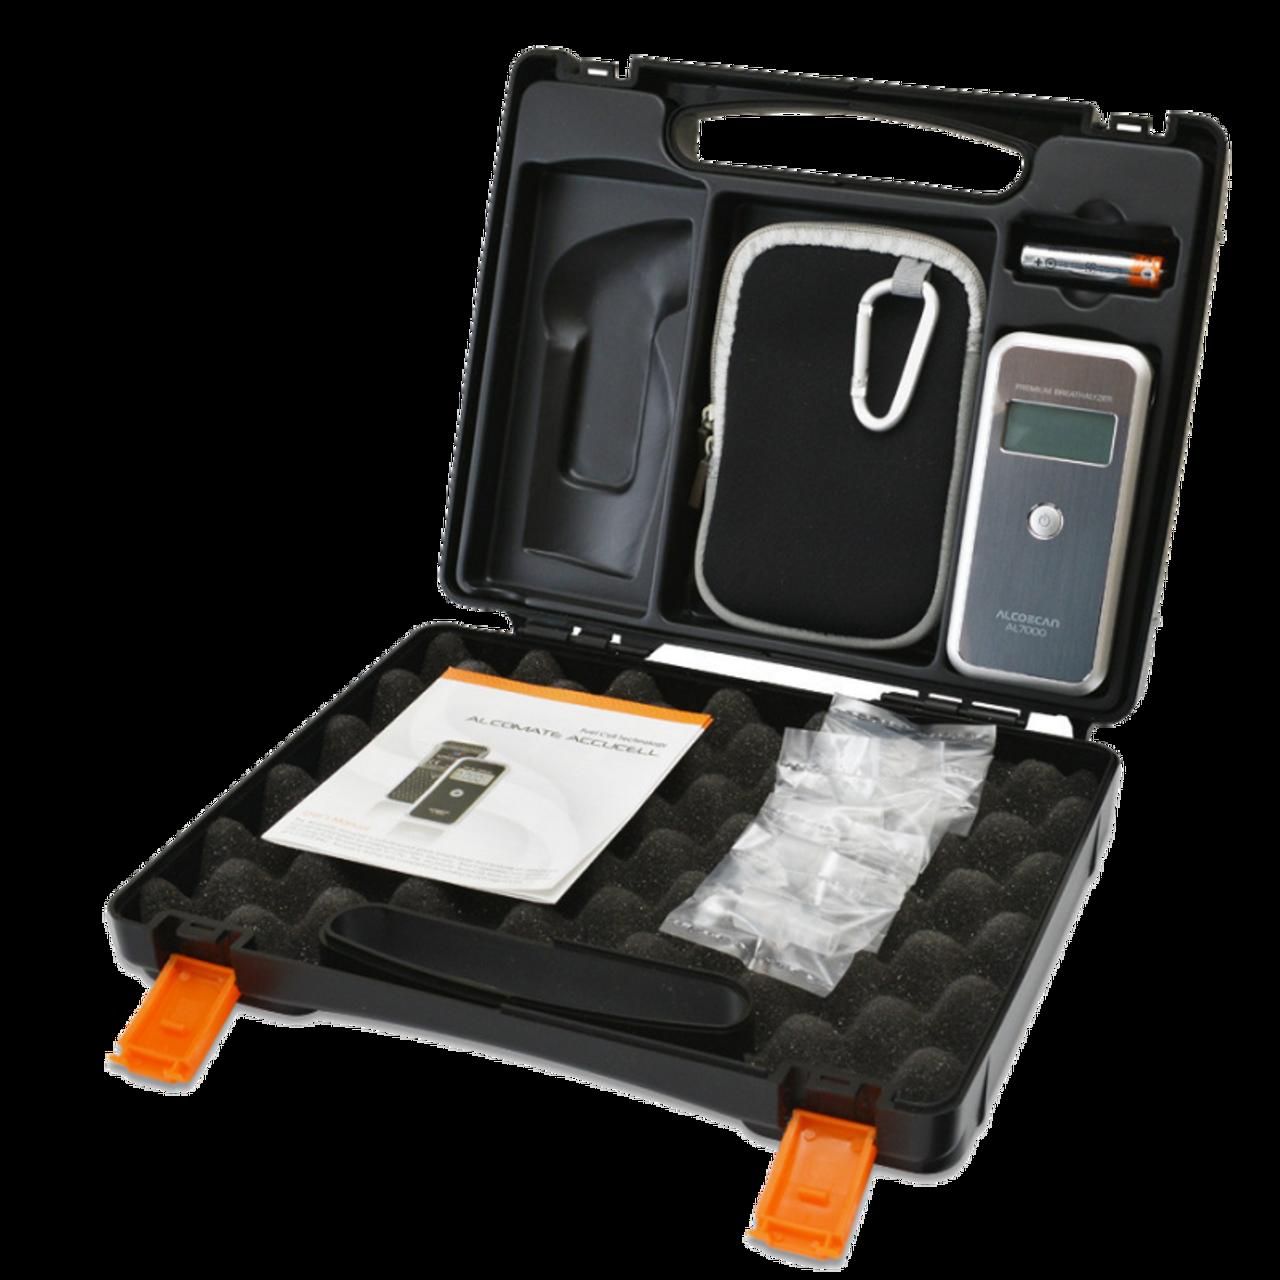 AlcoMate Breathalyzer Premium Alcohol Tester Hard Case Combo Pack 7000-F